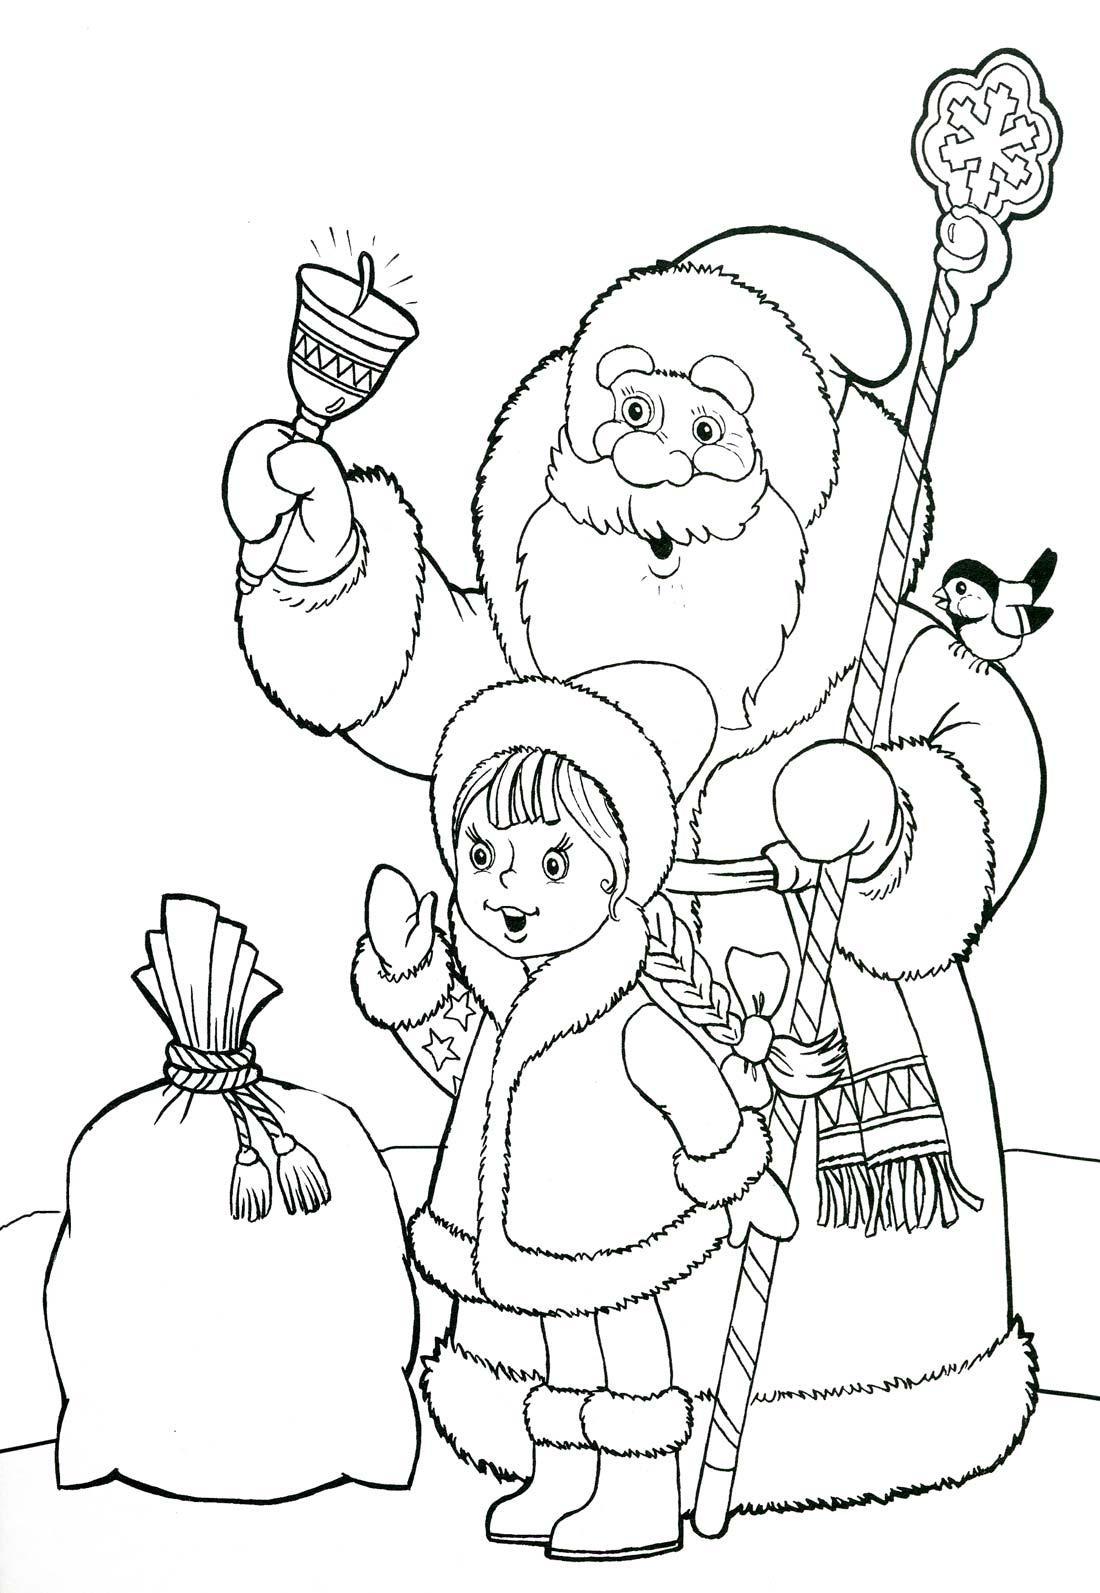 Дед мороз рисунок раскраска